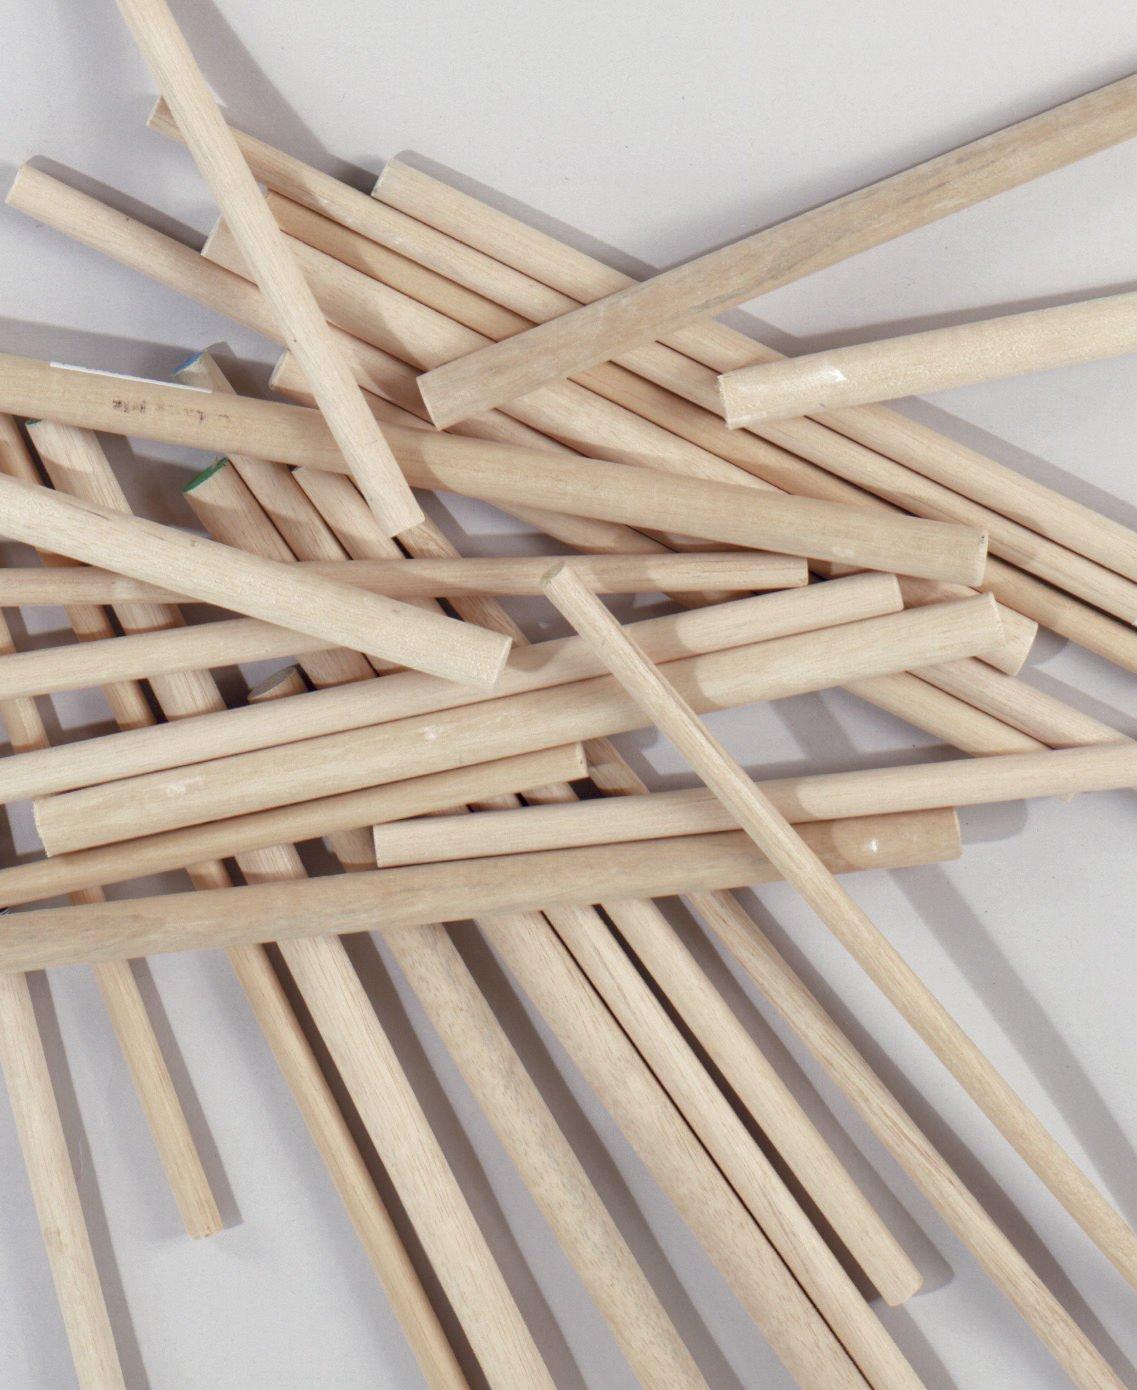 Pack of 9 Round Hardwood Dowel Rods 1-1/4'' Dia x 36'' Long 7320U C.C. Forest Grn